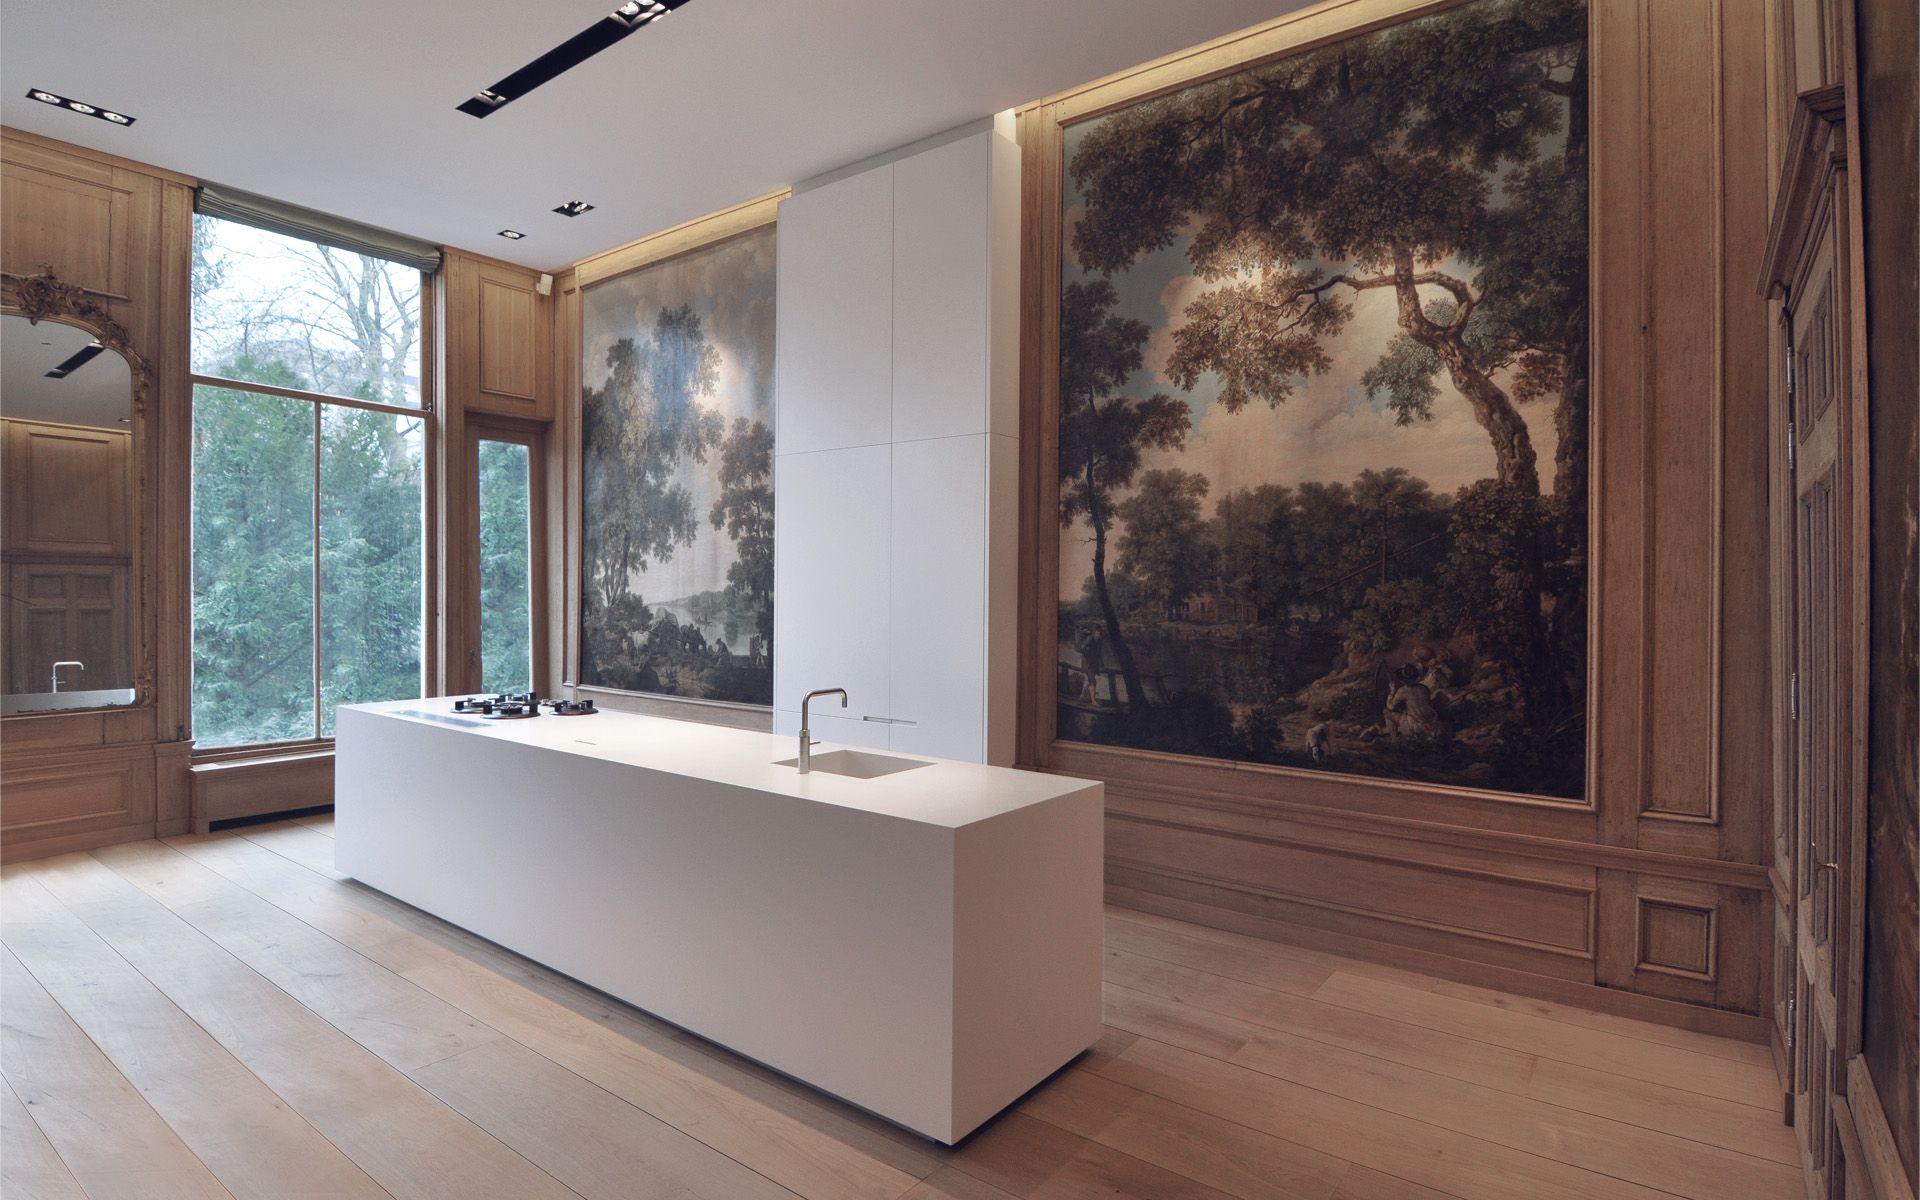 Herensgracht by miyo studio herengracht amsterdam noord holland